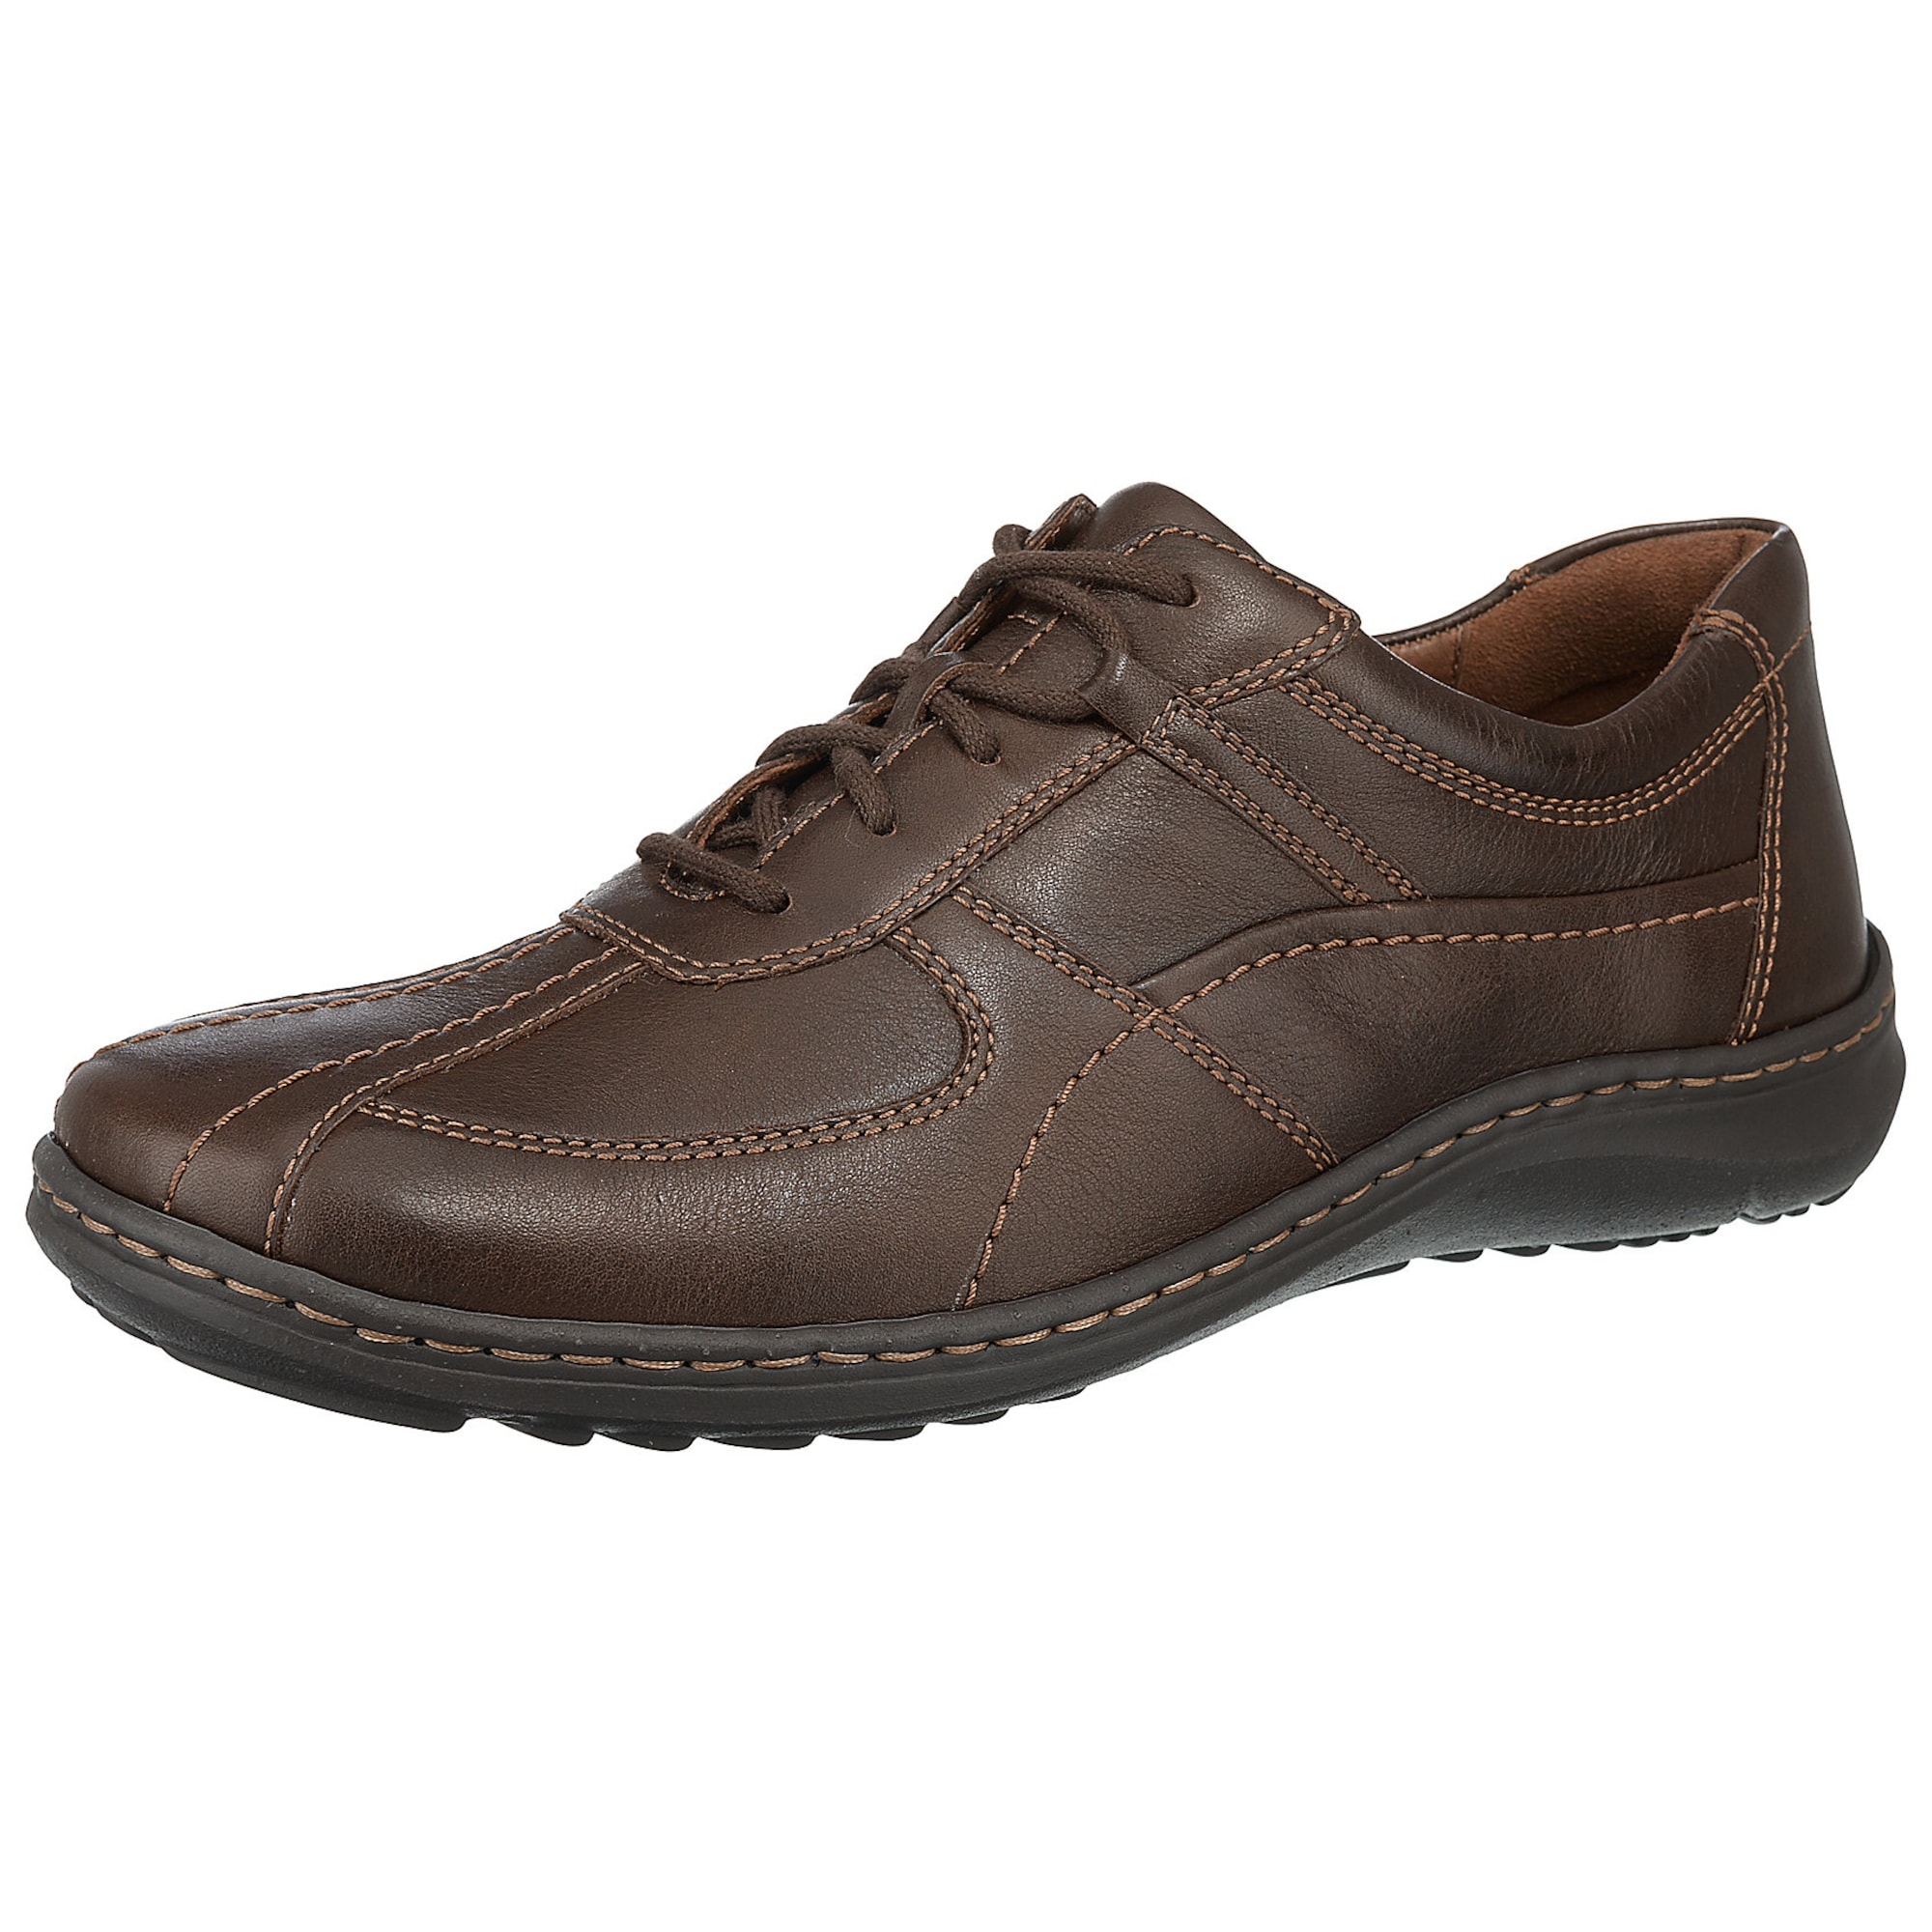 Halbschuhe 'Herwig' | Schuhe > Boots > Boots | WALDLÄUFER